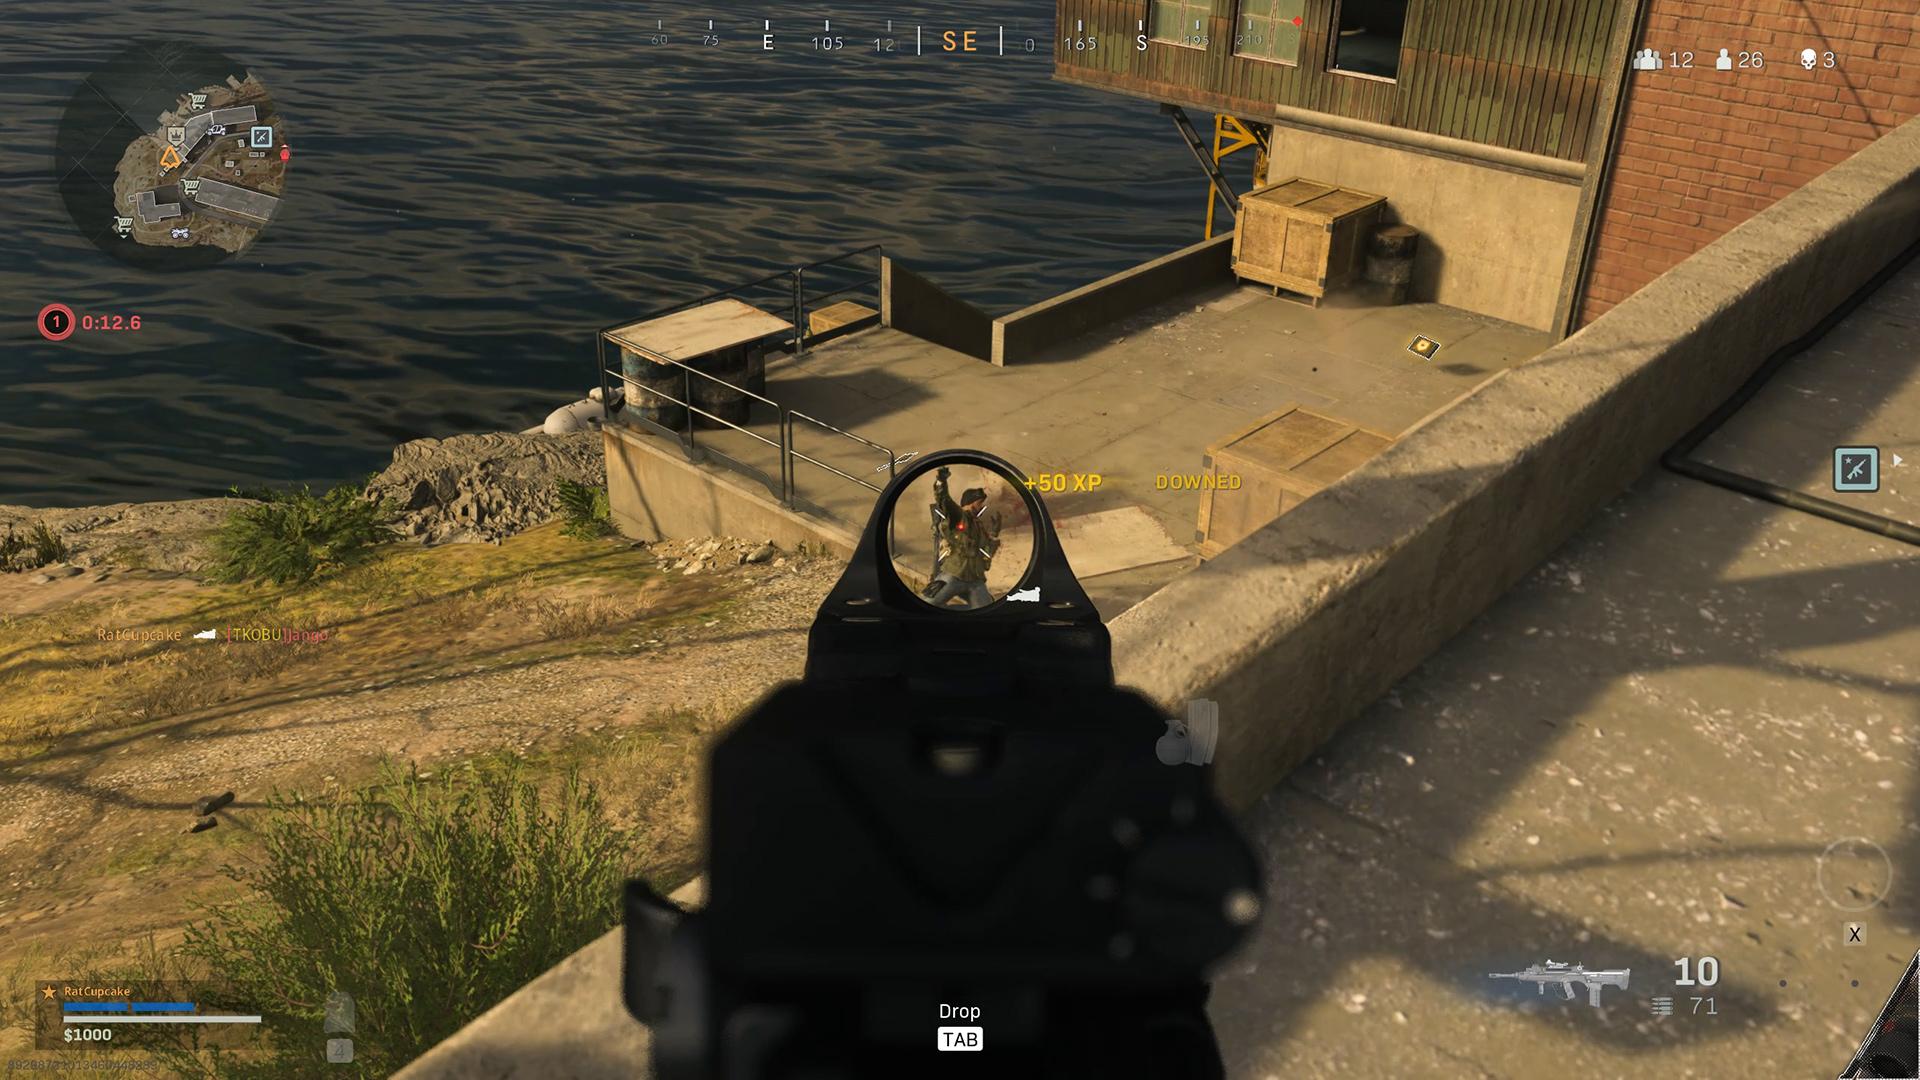 best Warzone loadout - An enemy on Rebirth Island is gunned down